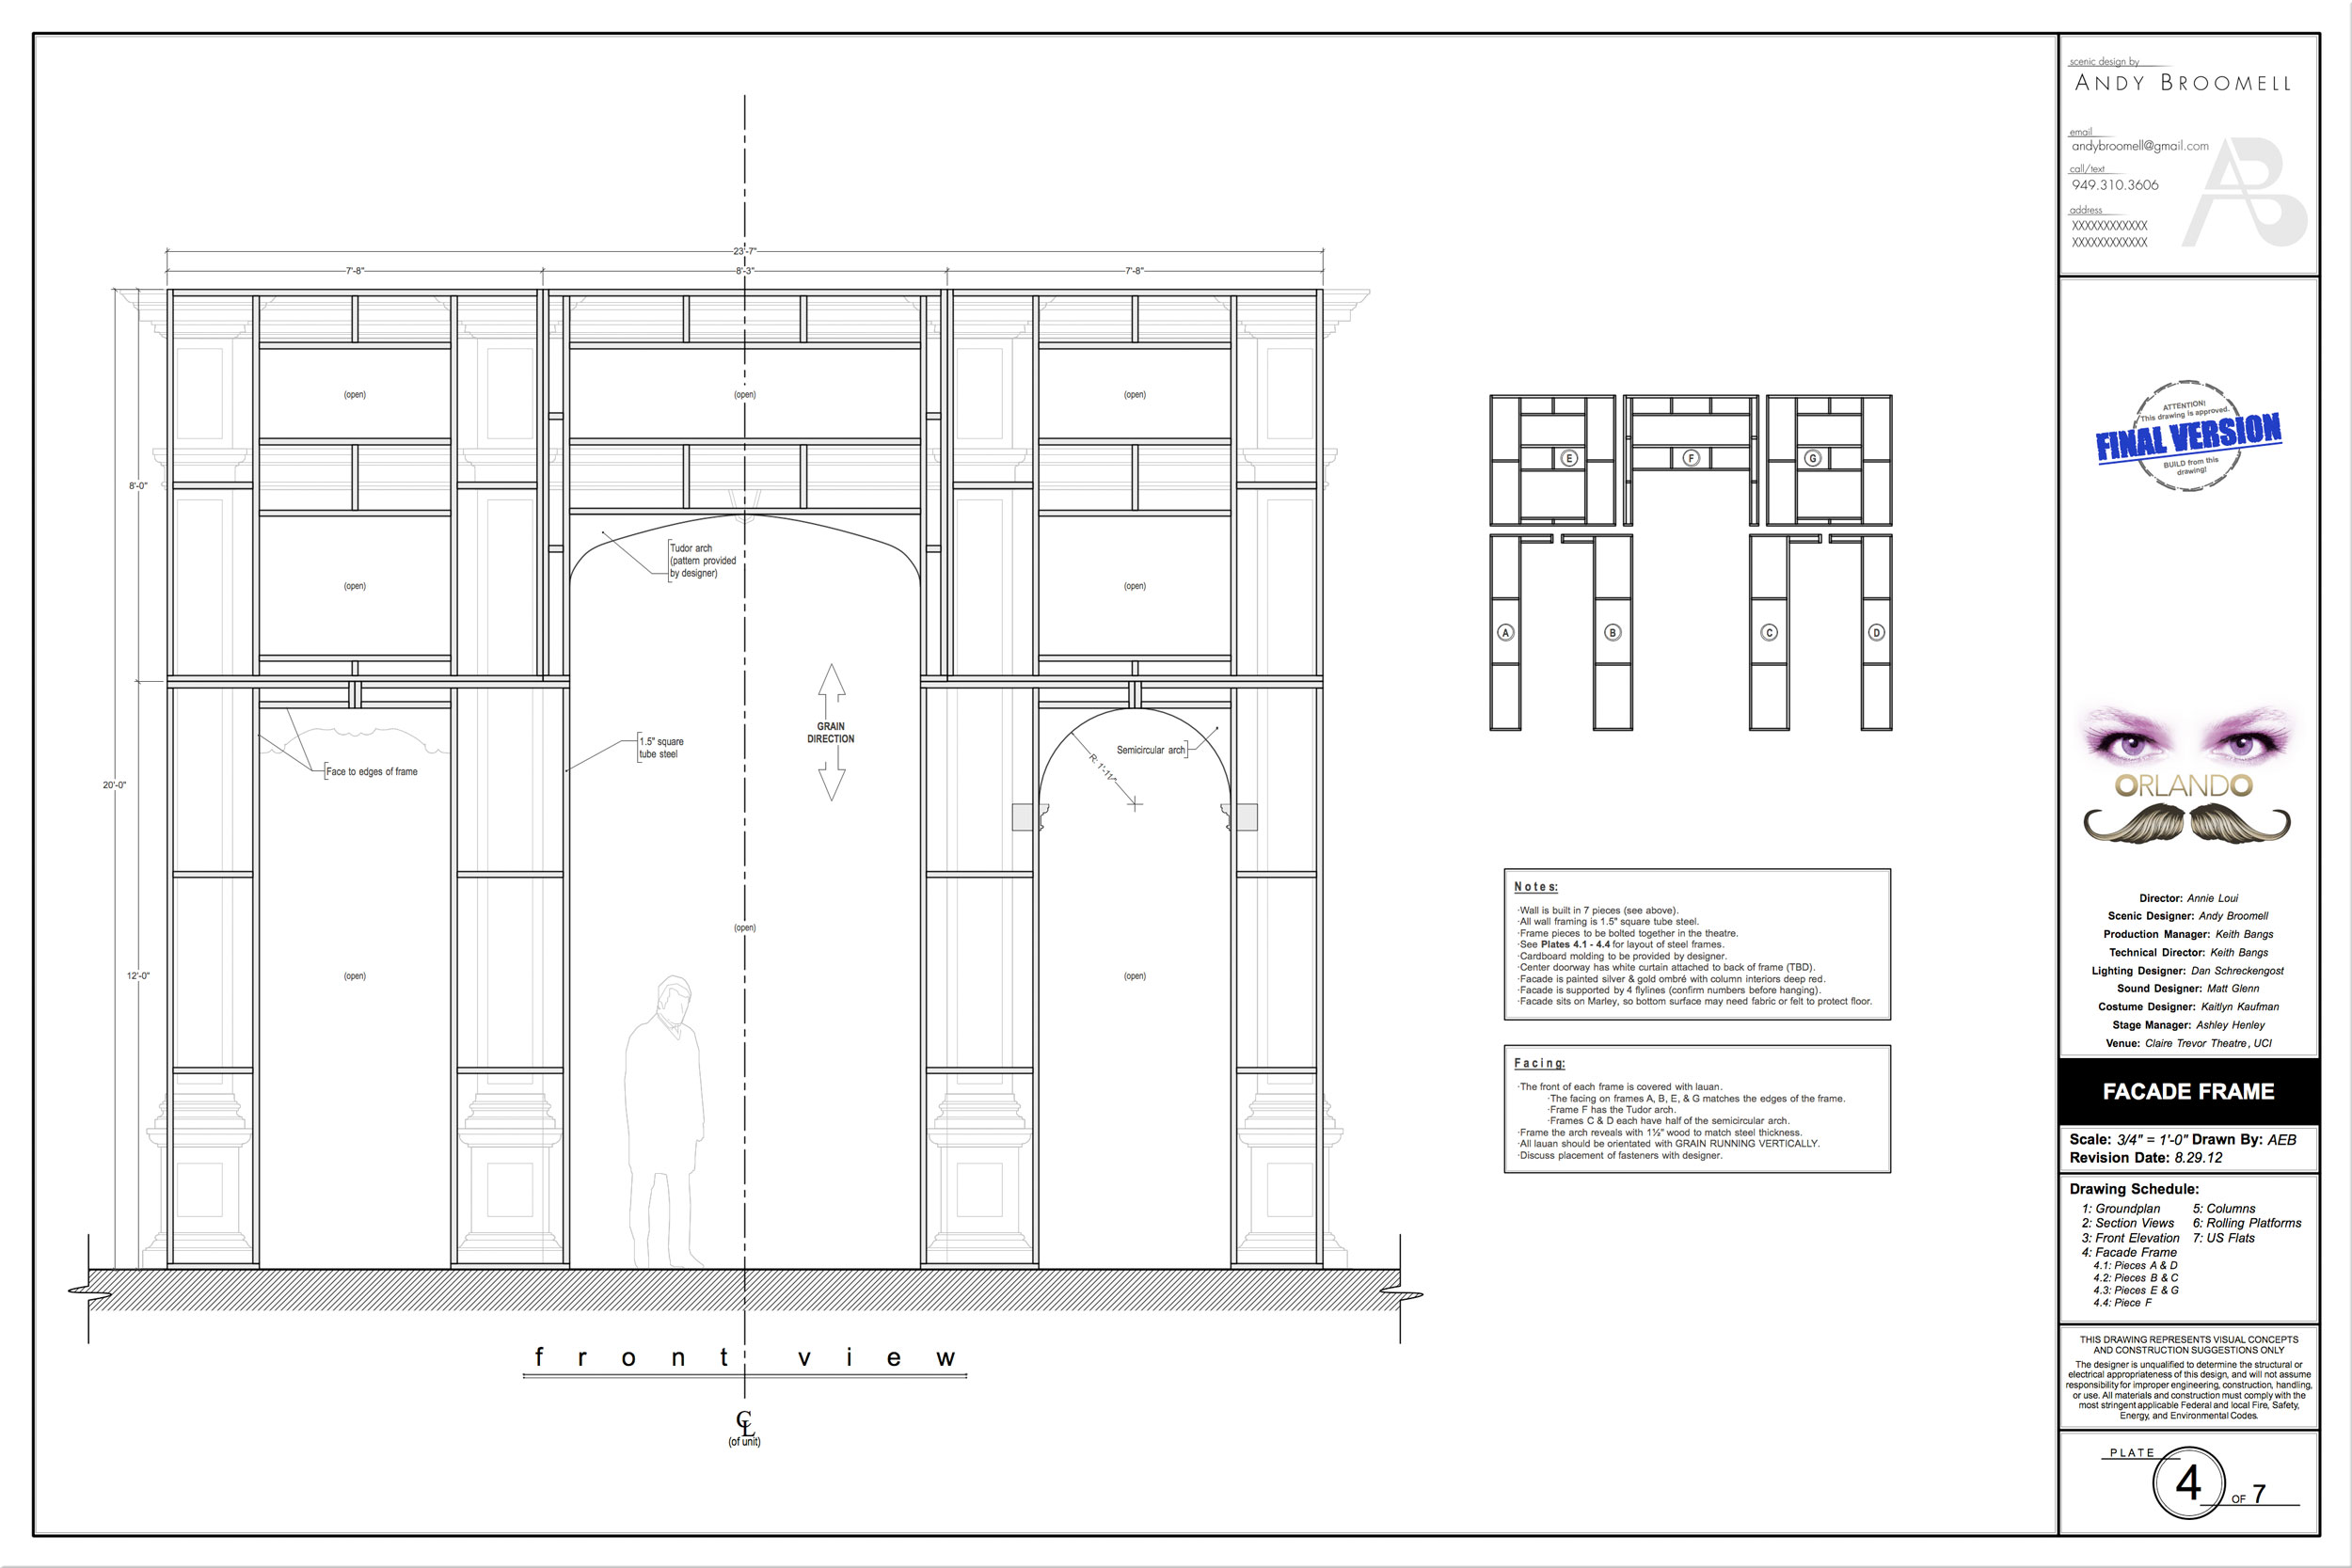 andy-broomell-scenic-design-drafting-orlando-4.jpg